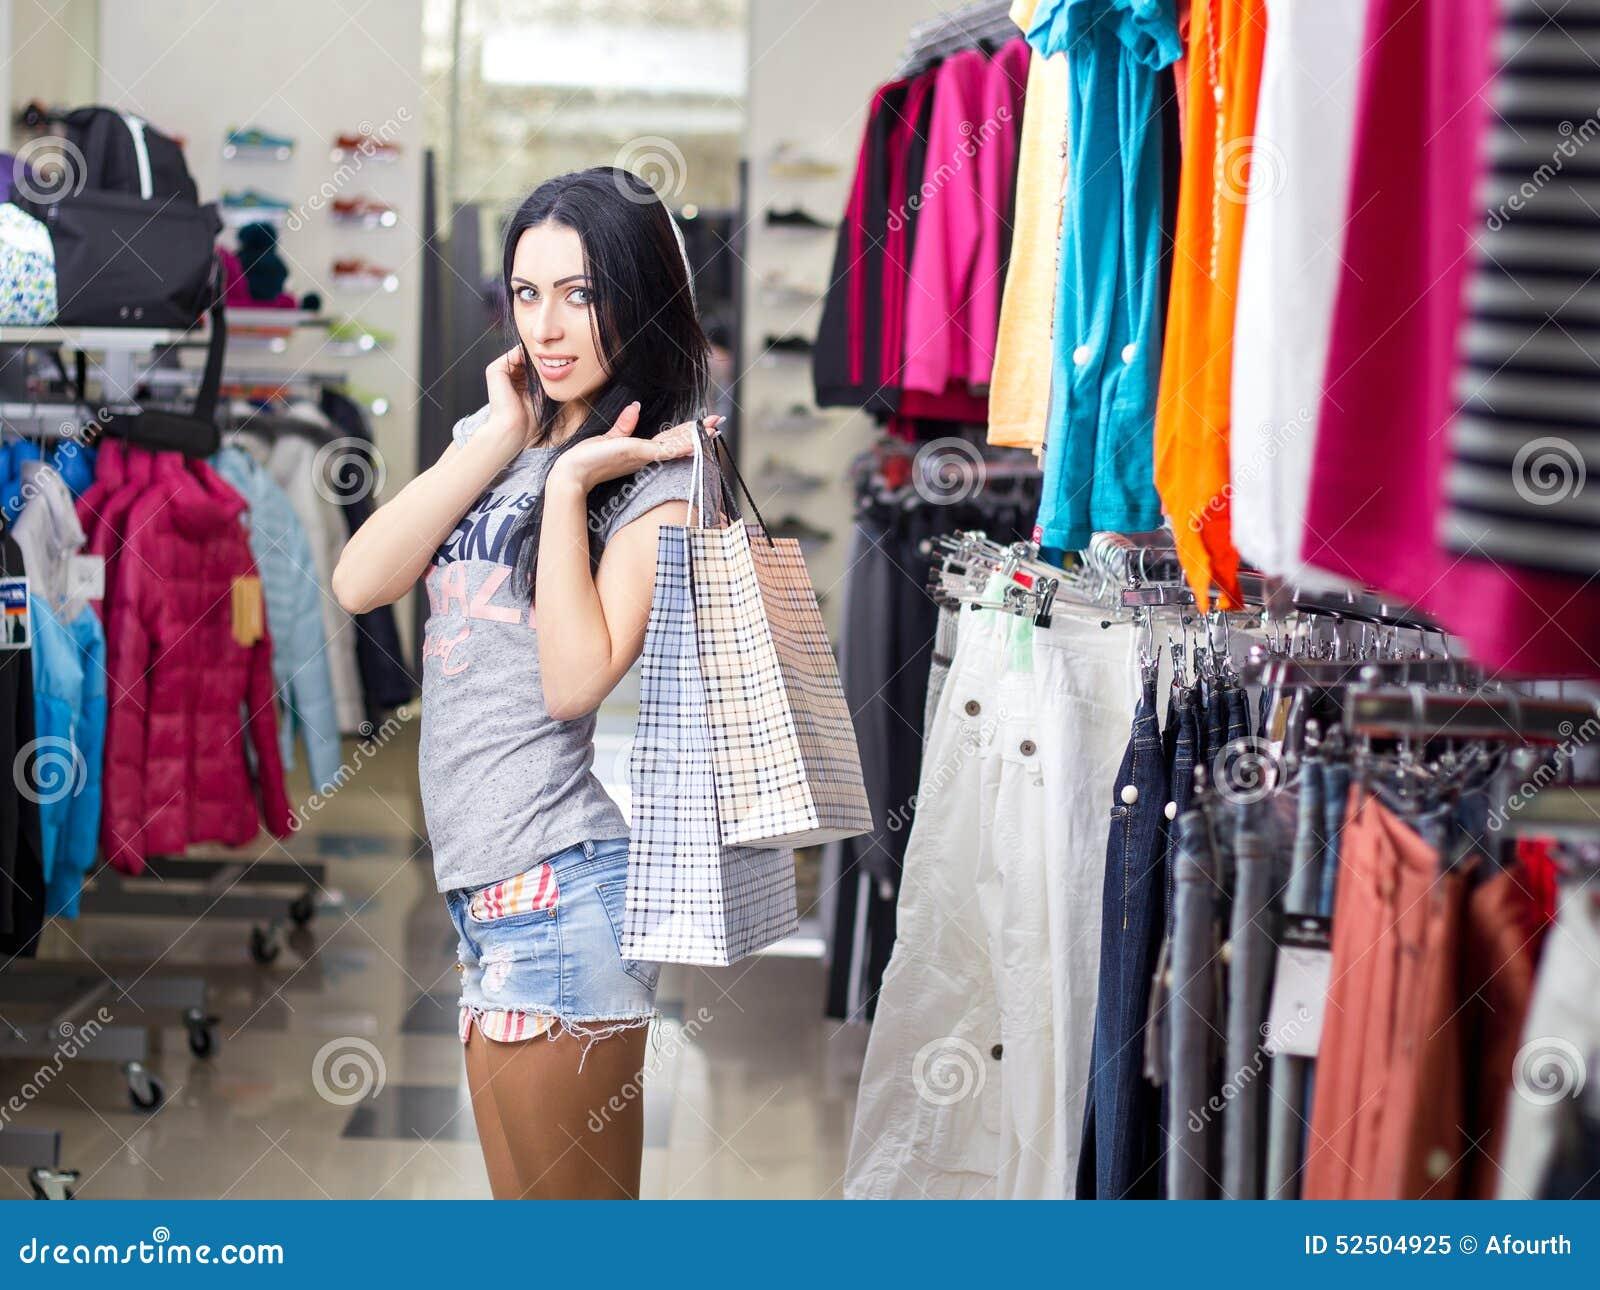 6c0a8e8bb19 Mujer en almacén de ropa imagen de archivo. Imagen de ropa - 52504925